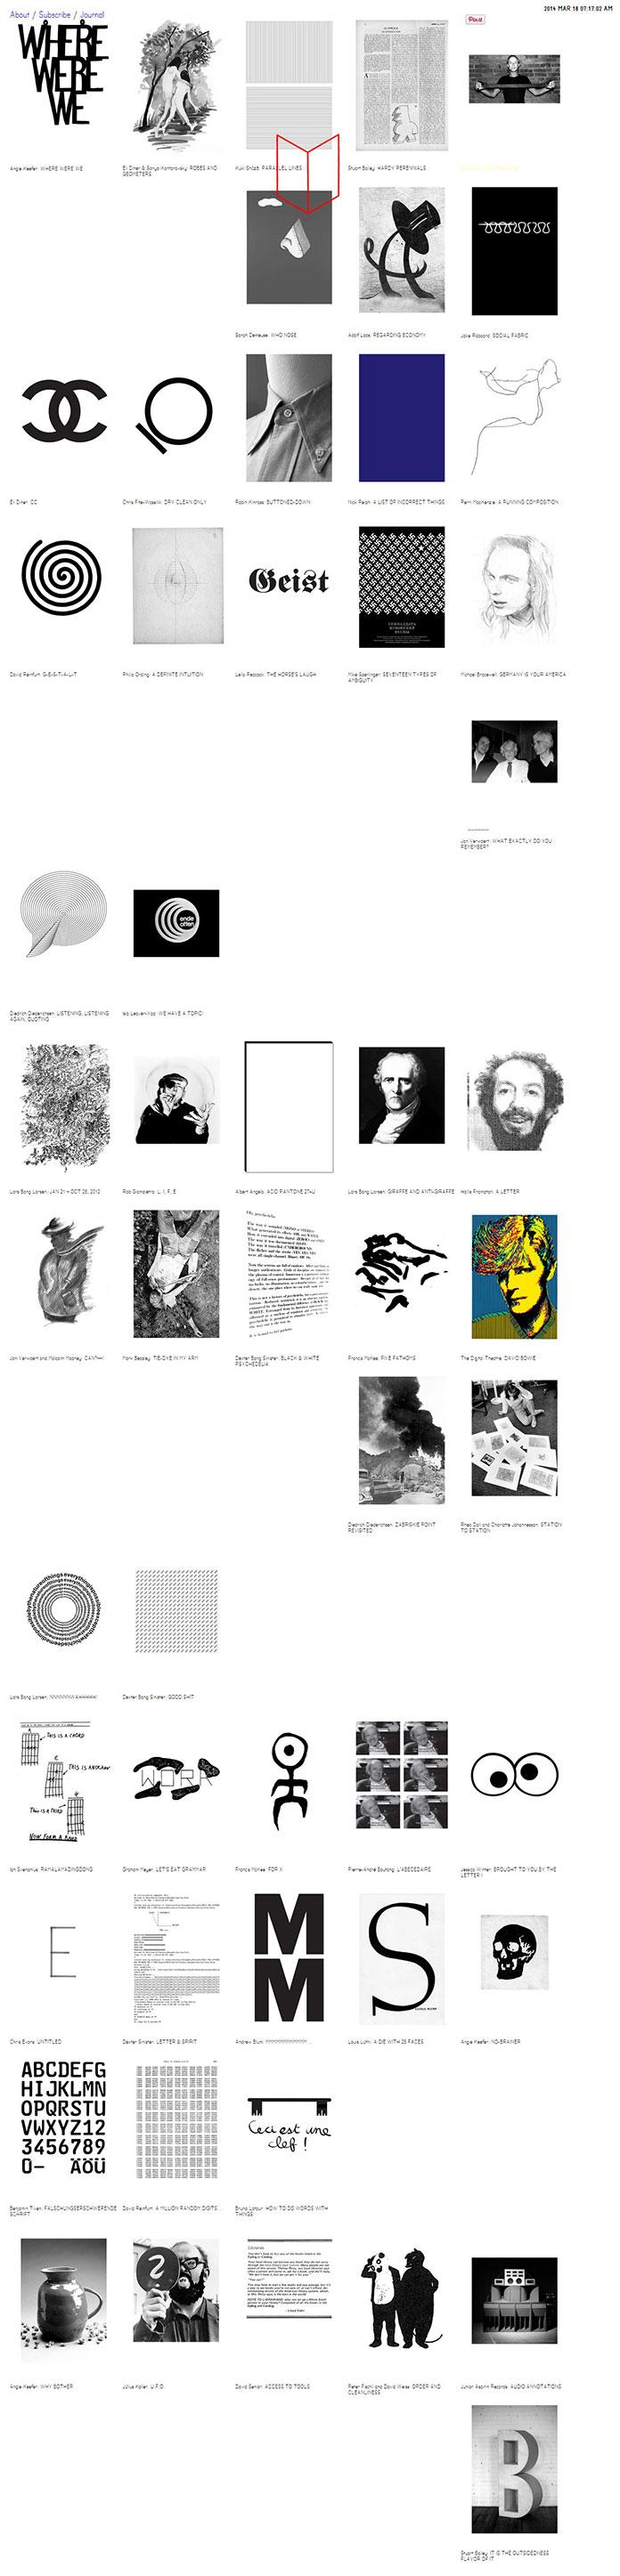 The-Serving-Library-dexter-sinister-pdf-graphisme